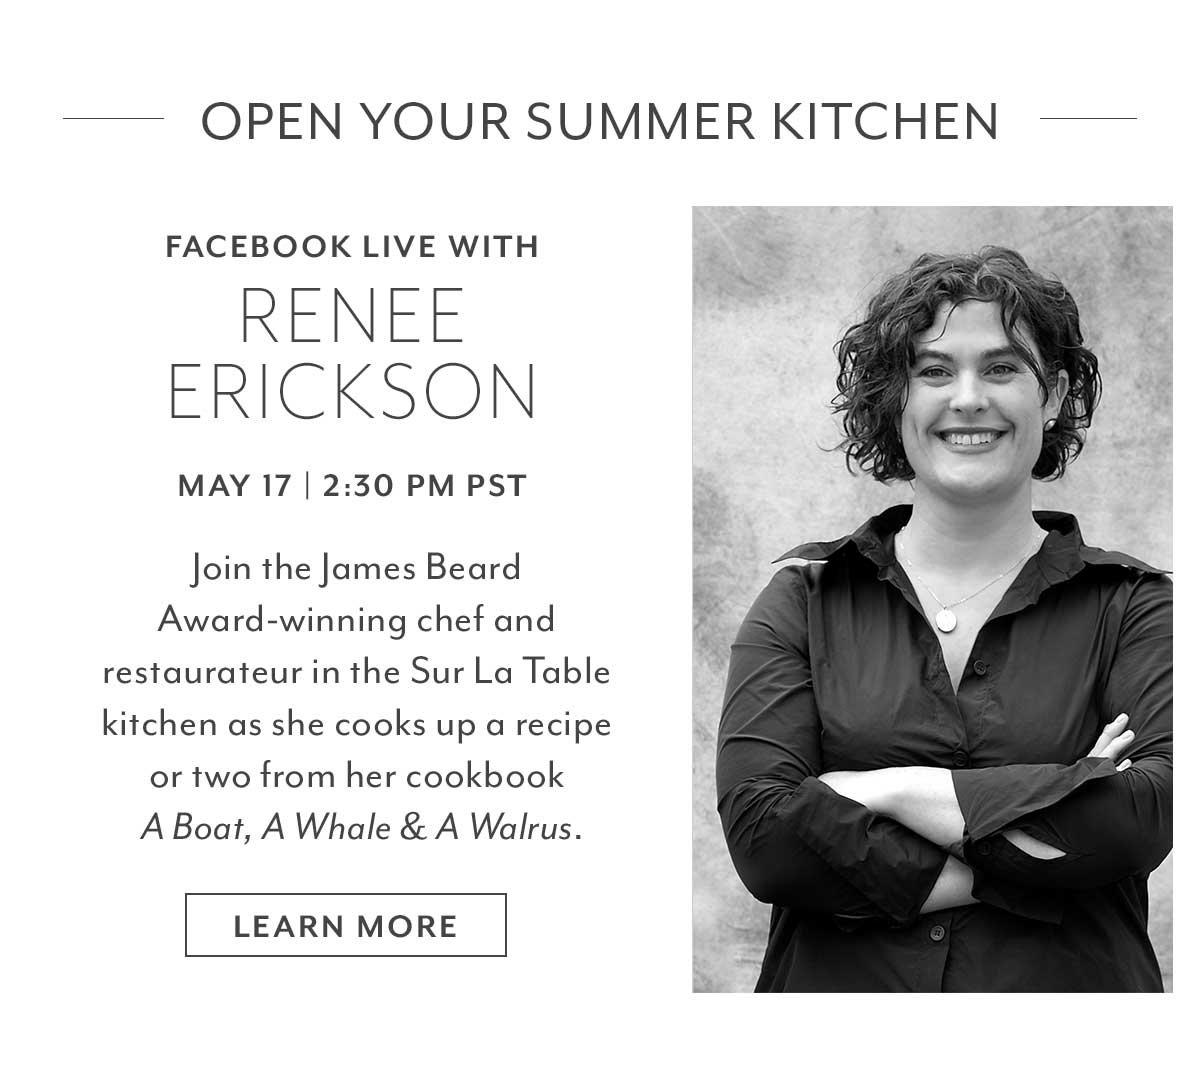 Tomorrow: Facebook Live with Renee Erickson